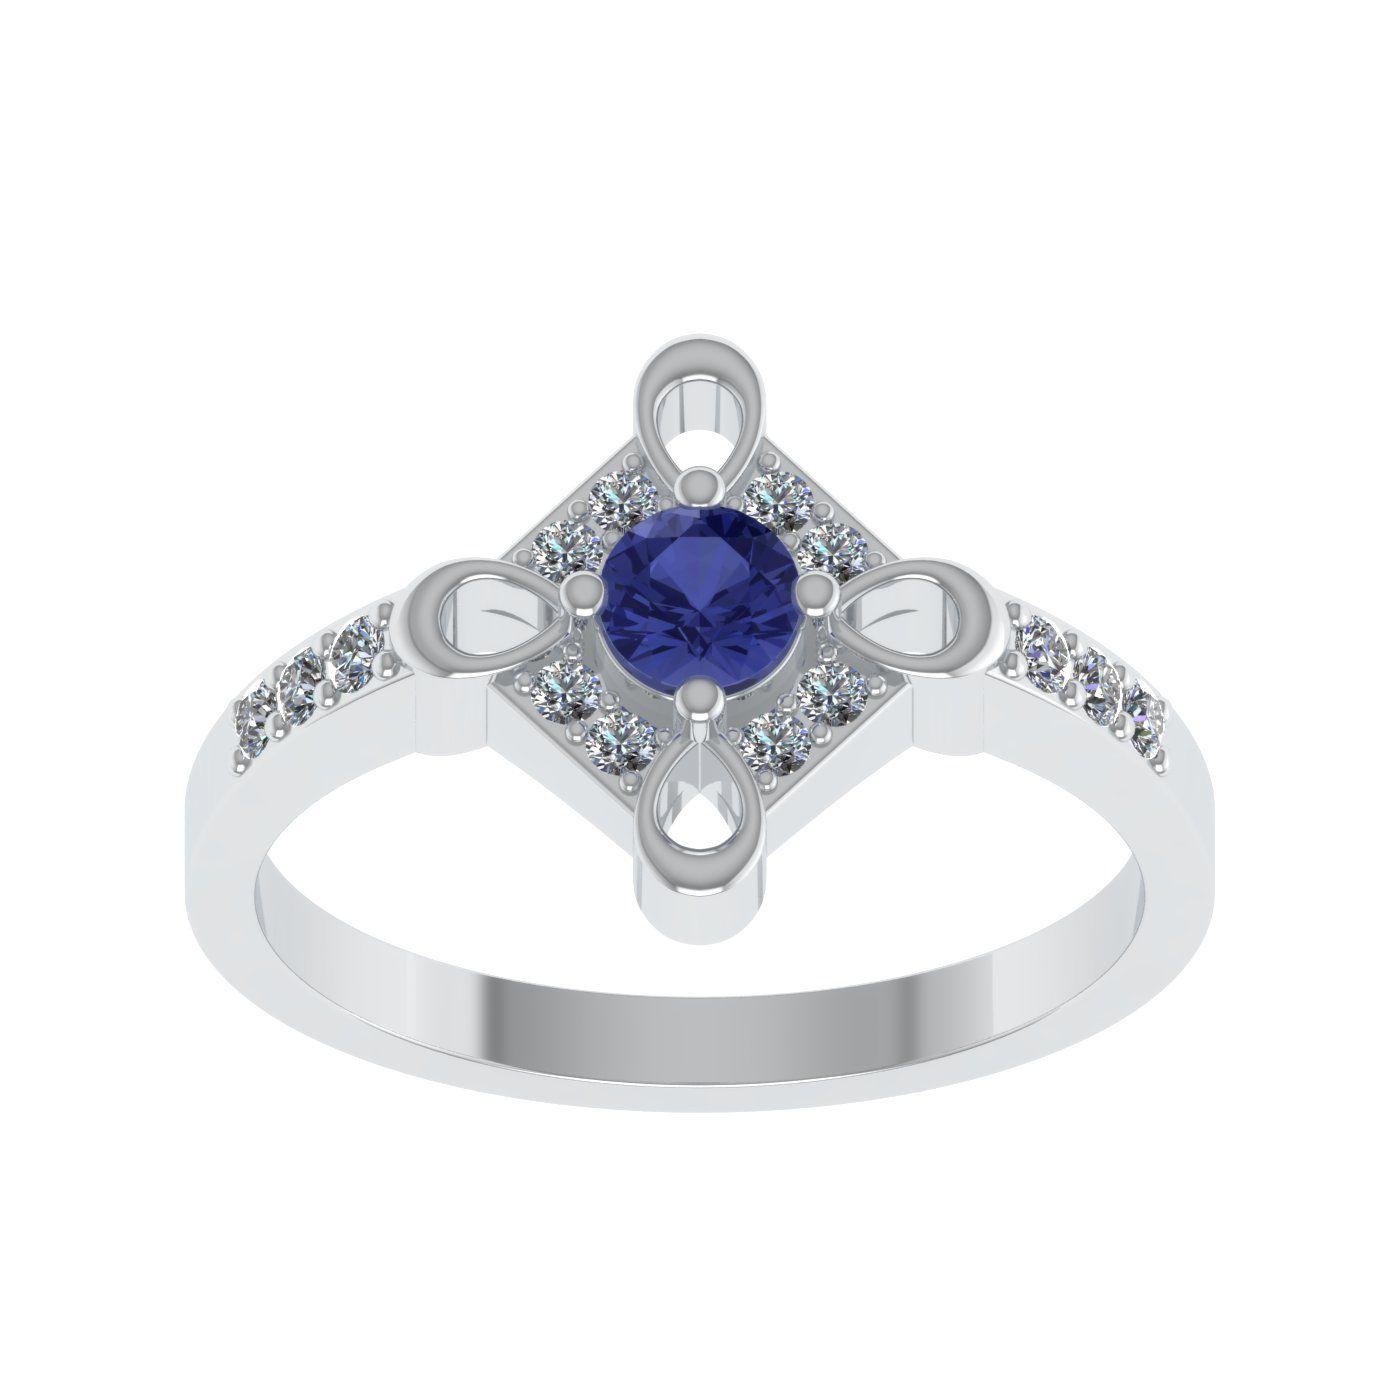 Shreeji Jewellers 925 Sterling Silver Sterling Silver Ring